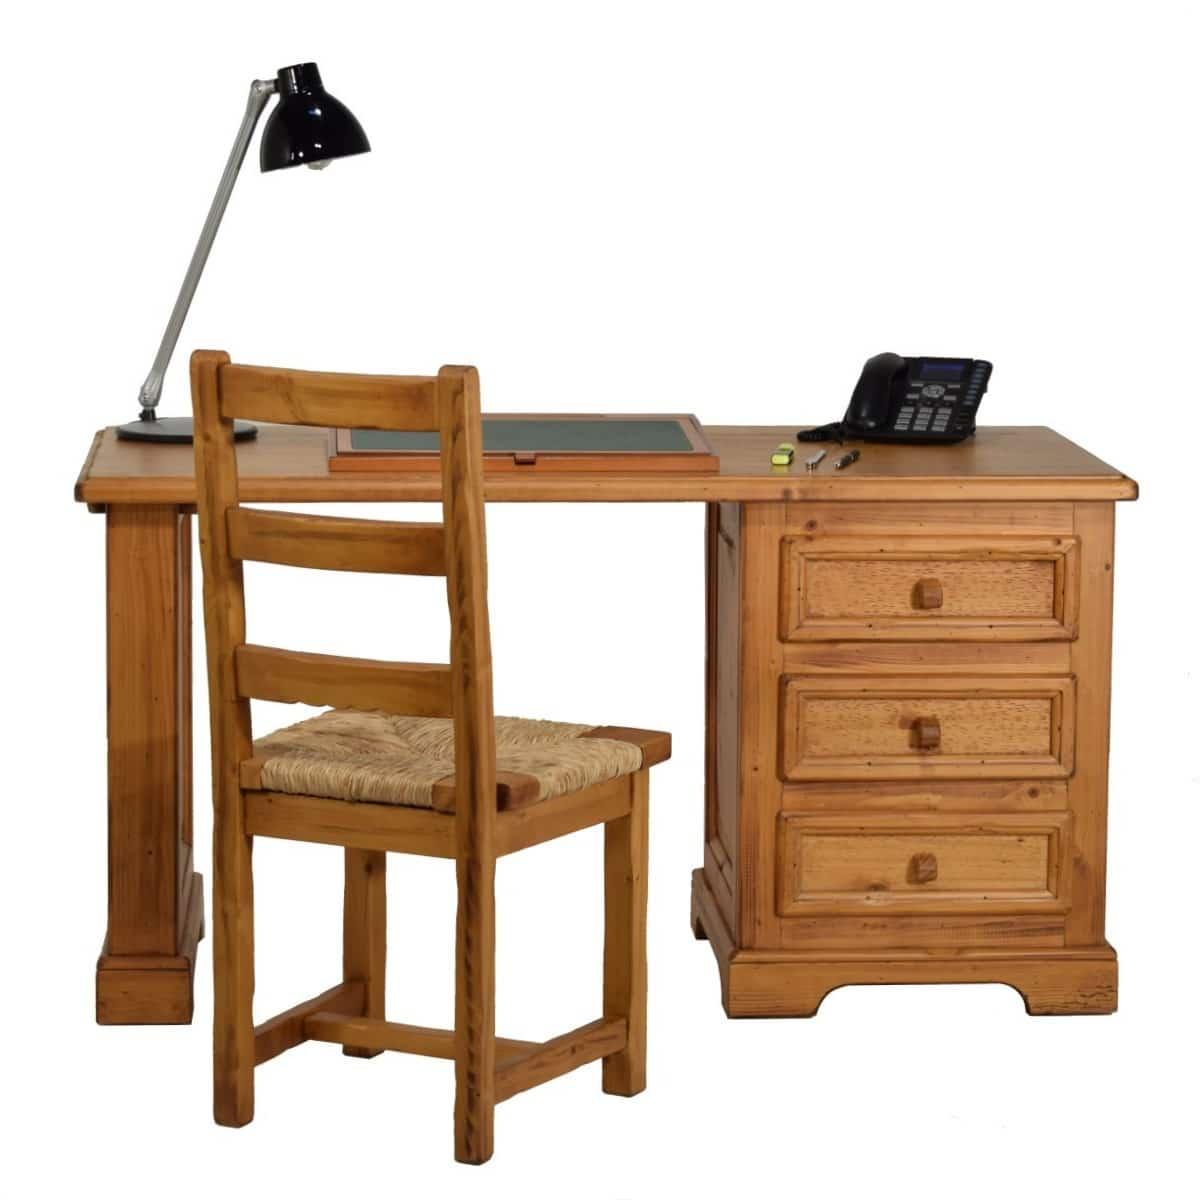 Escritorio r stico de madera peque o cajones ecor stico - Escritorio rustico barato ...